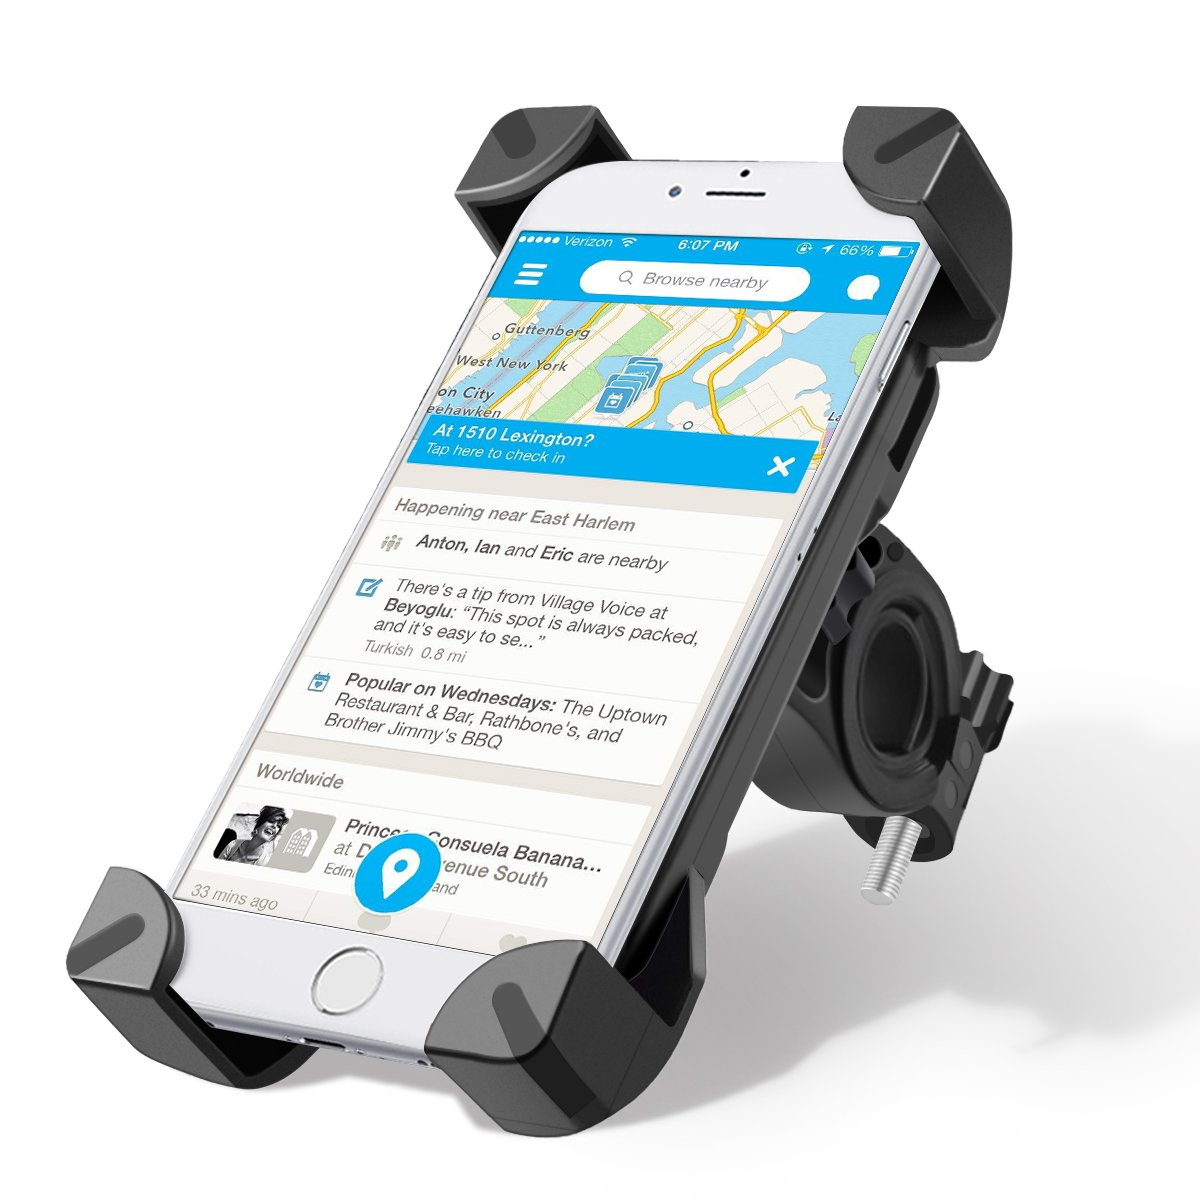 Soporte mó vil Bicicleta, Wrcibo Montura Soporte Universal de Bicicleta ajustable de Telé fono para el smartphone iPhone GPS (Negro) Wrcibo Montura Soporte Universal de Bicicleta ajustable de Teléfono para el smartphone iPhone GPS (Negro) 003